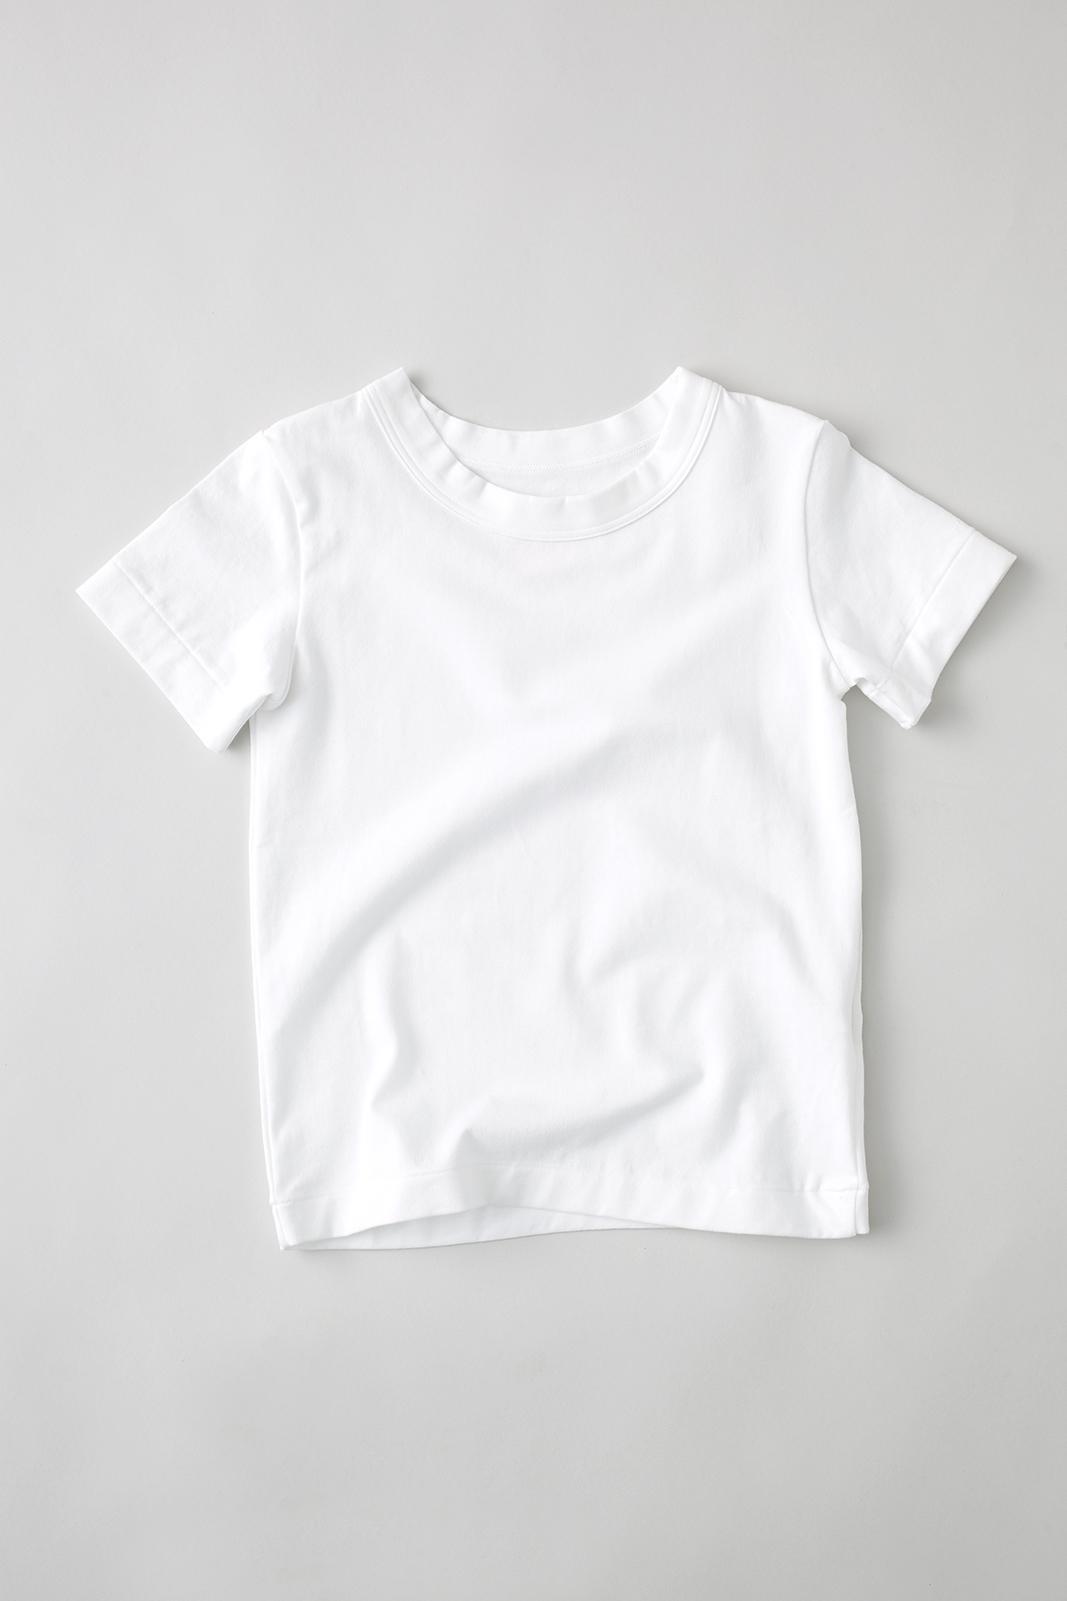 Camphor カンフル kids こども 子供服 everydaytee whitetee